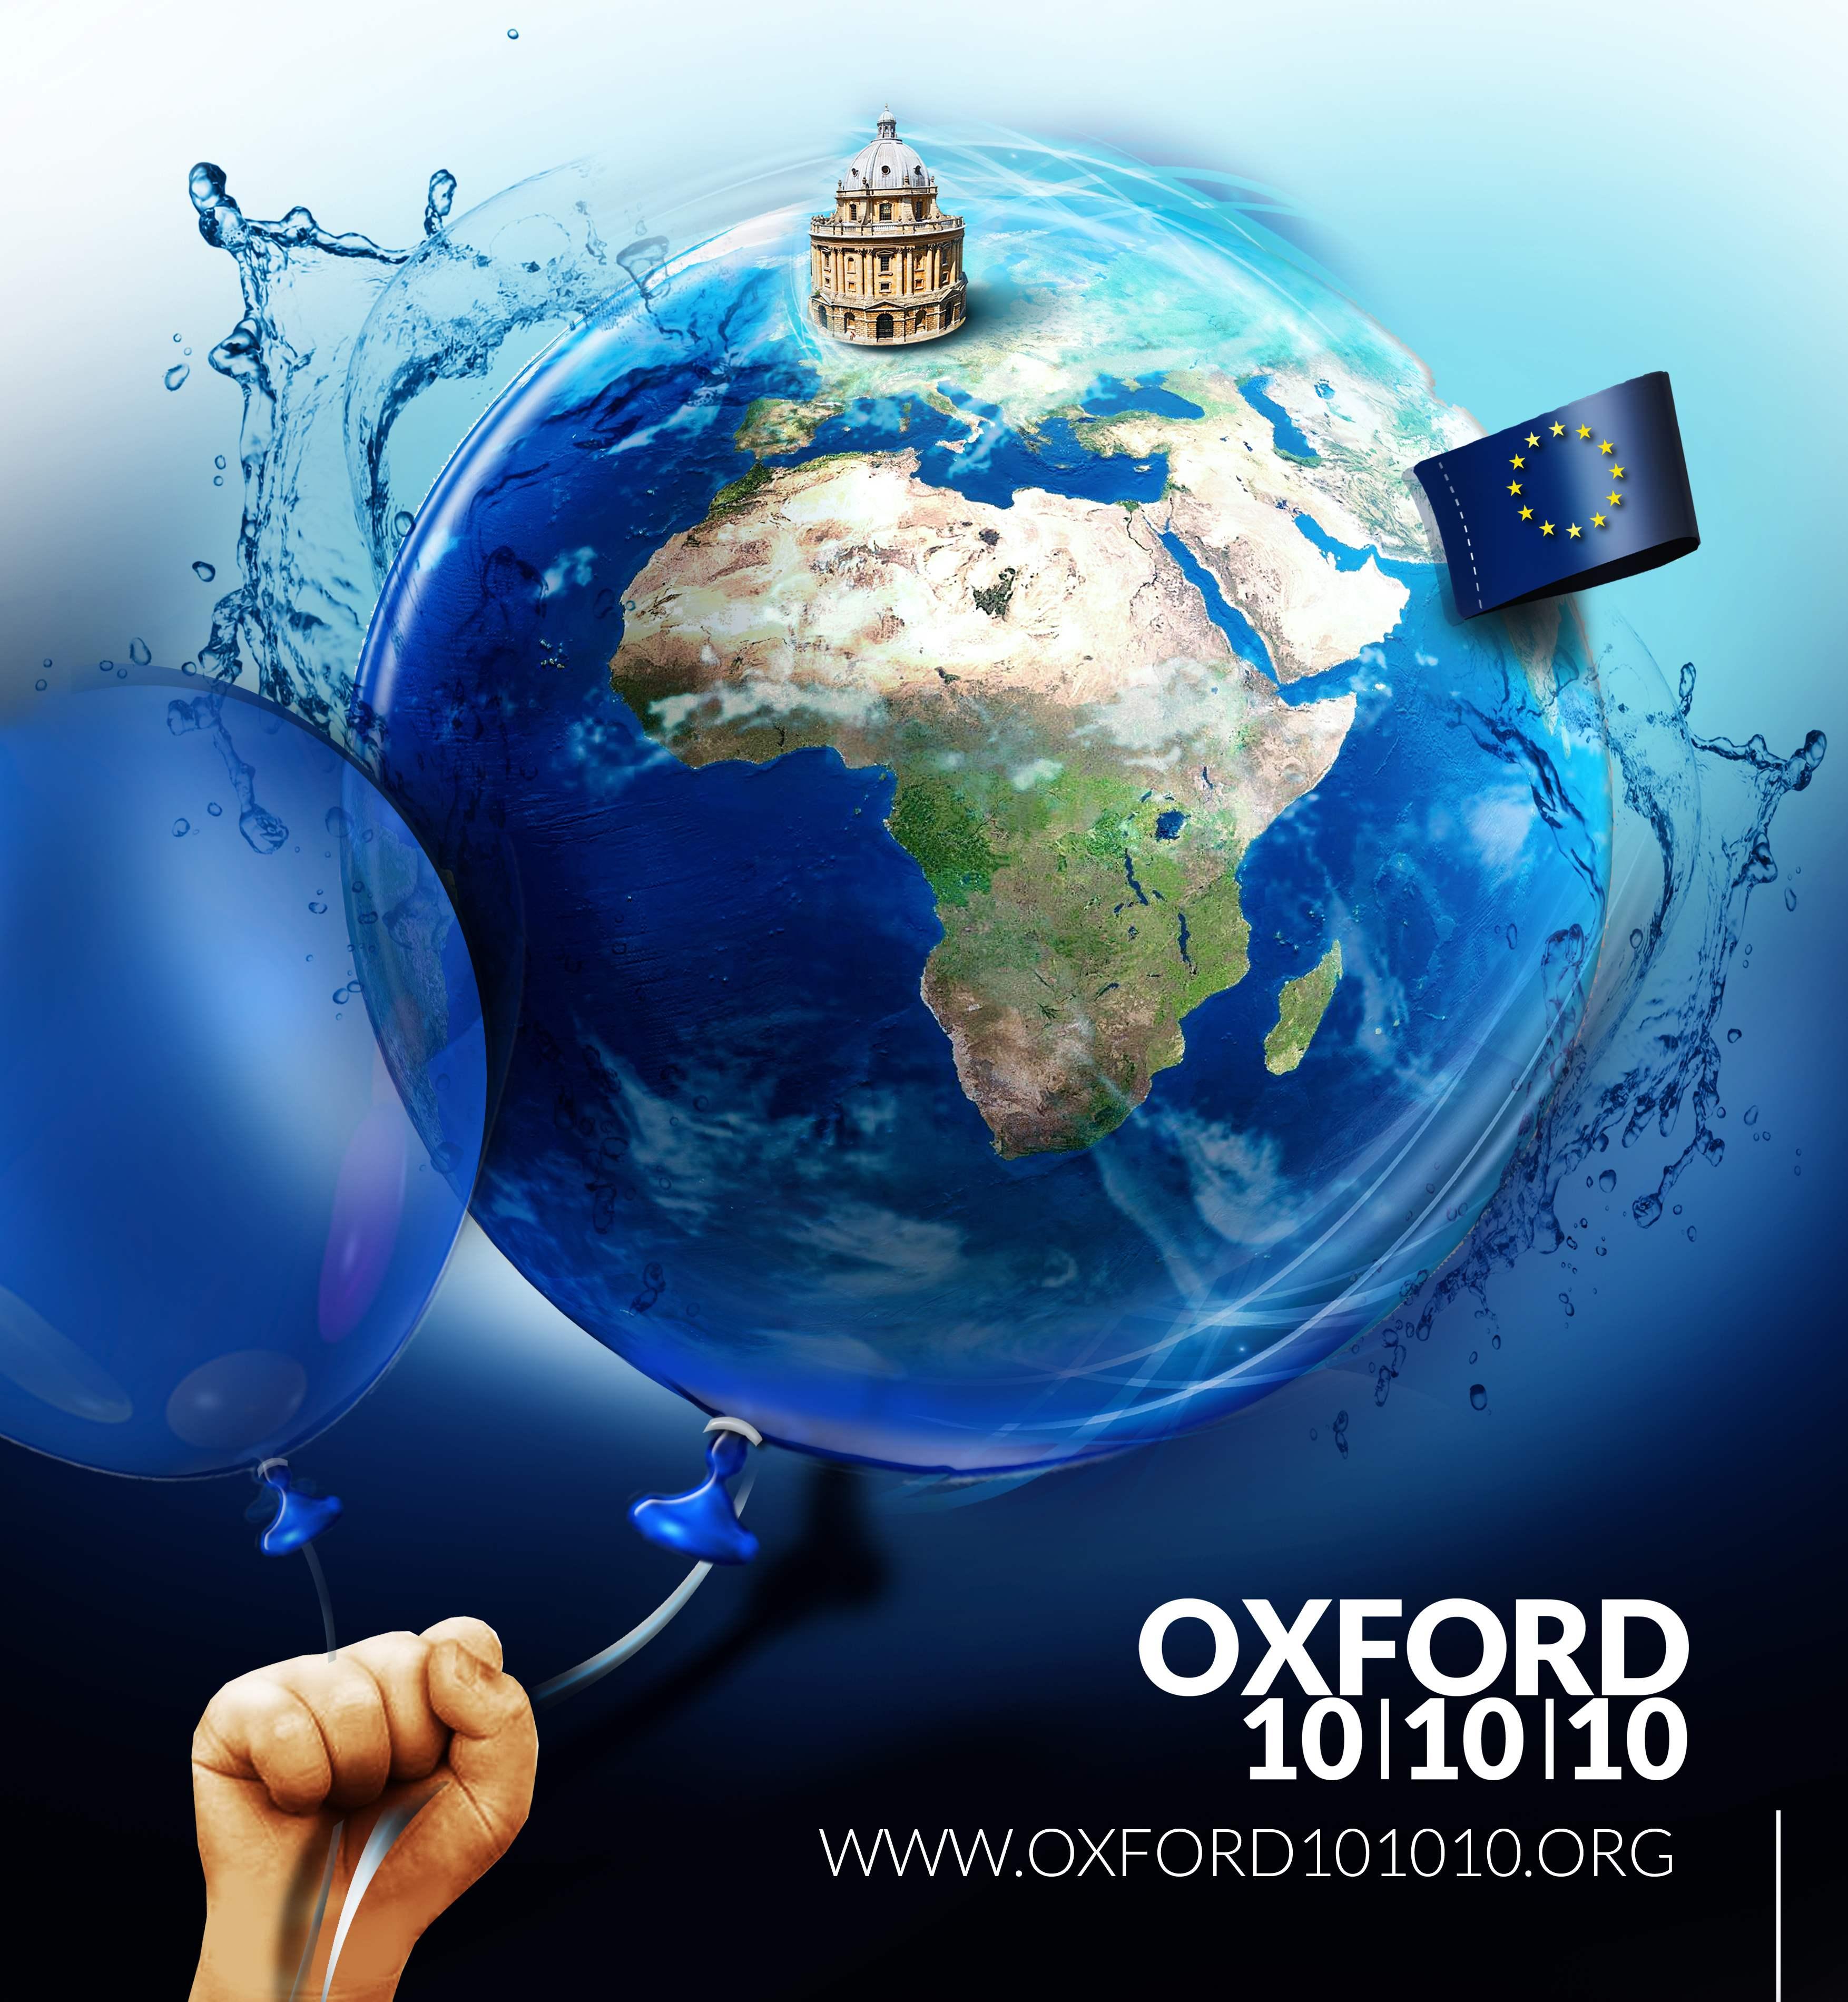 Oxford 10/10/10